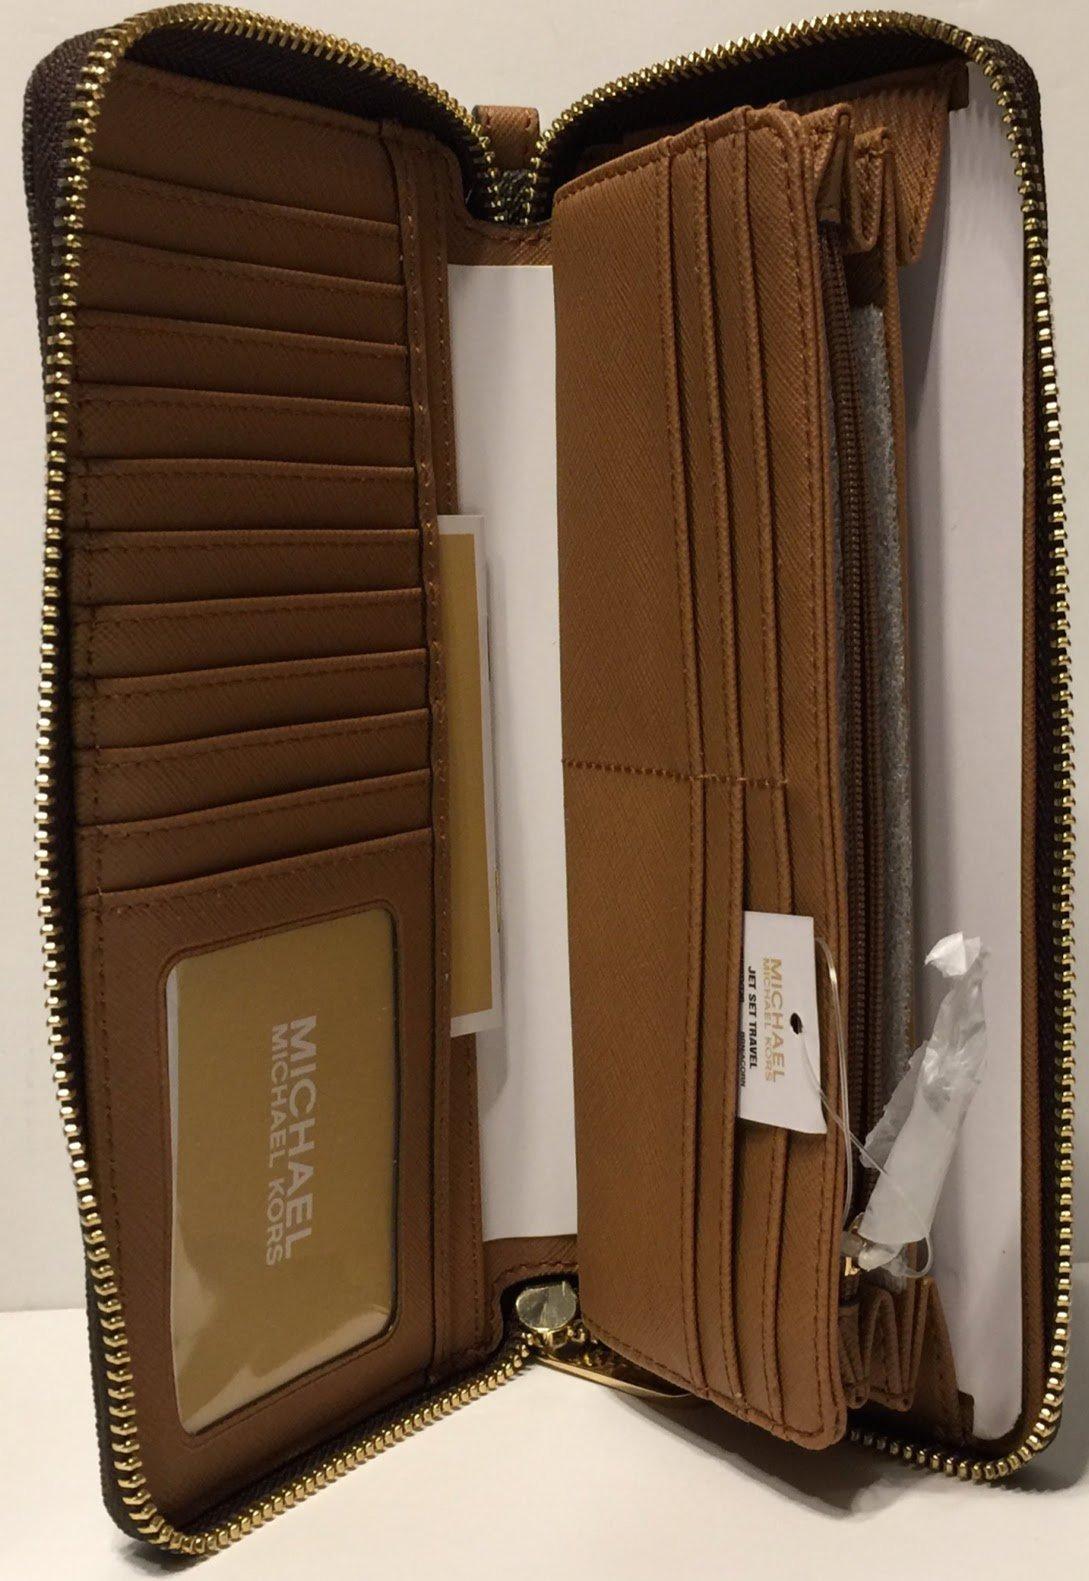 MICHAEL Michael Kors Ciara Large TZ Satchel bundled with Michael Kors Jet Set Travel Continental Wallet Wristlet (Signature MK Brown/Acorn) by Michael Kors (Image #9)